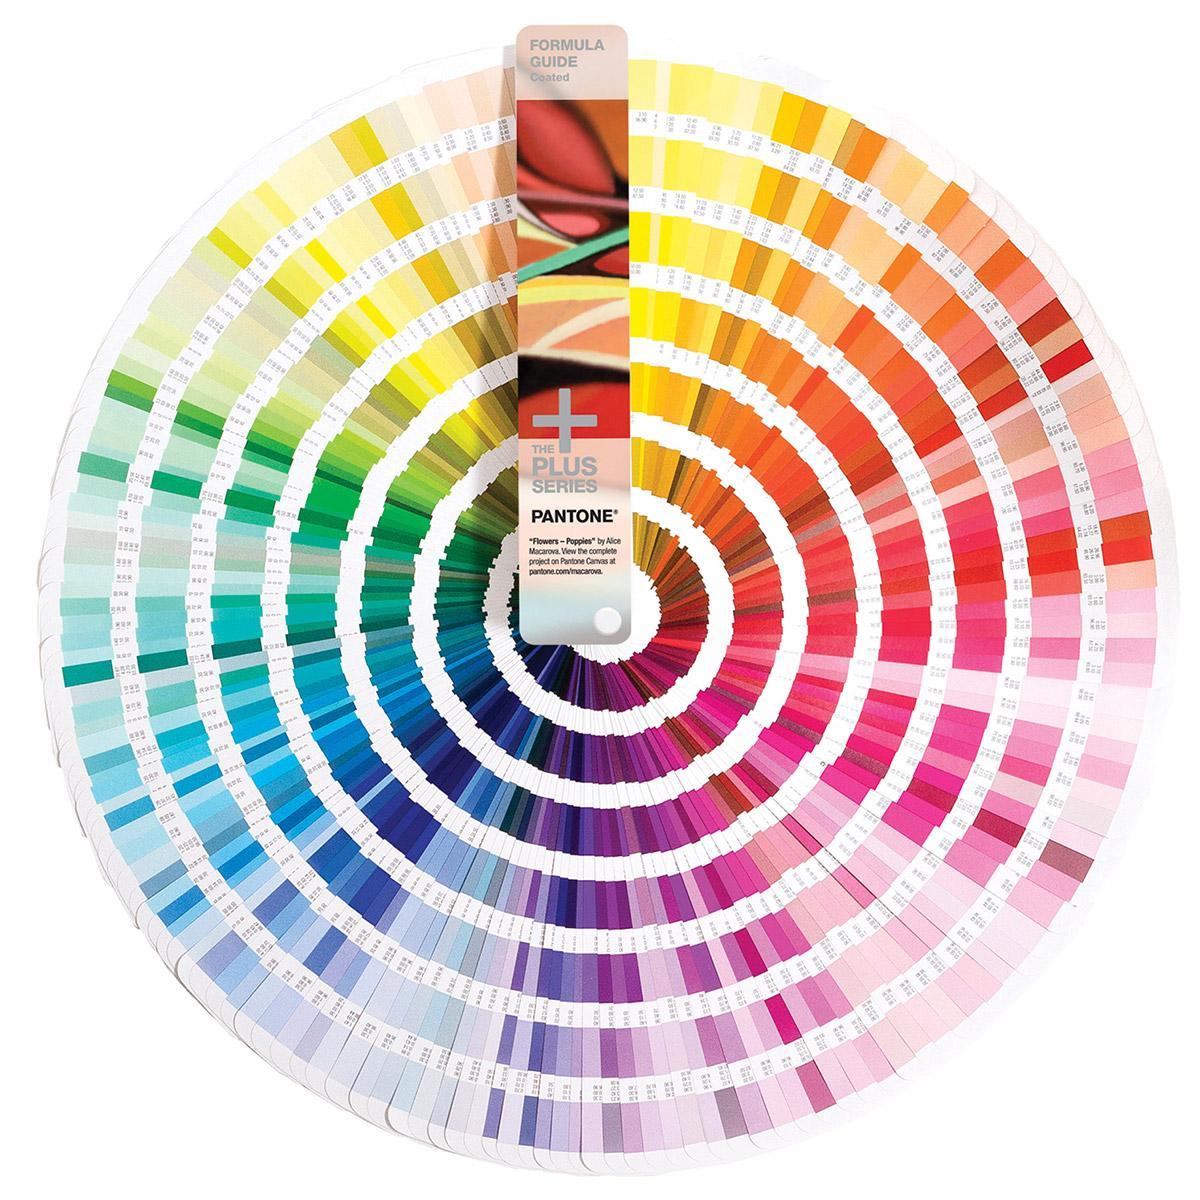 Cuscini Pantone.Pantone On Twitter Happy Internationalcolourday How Does Color